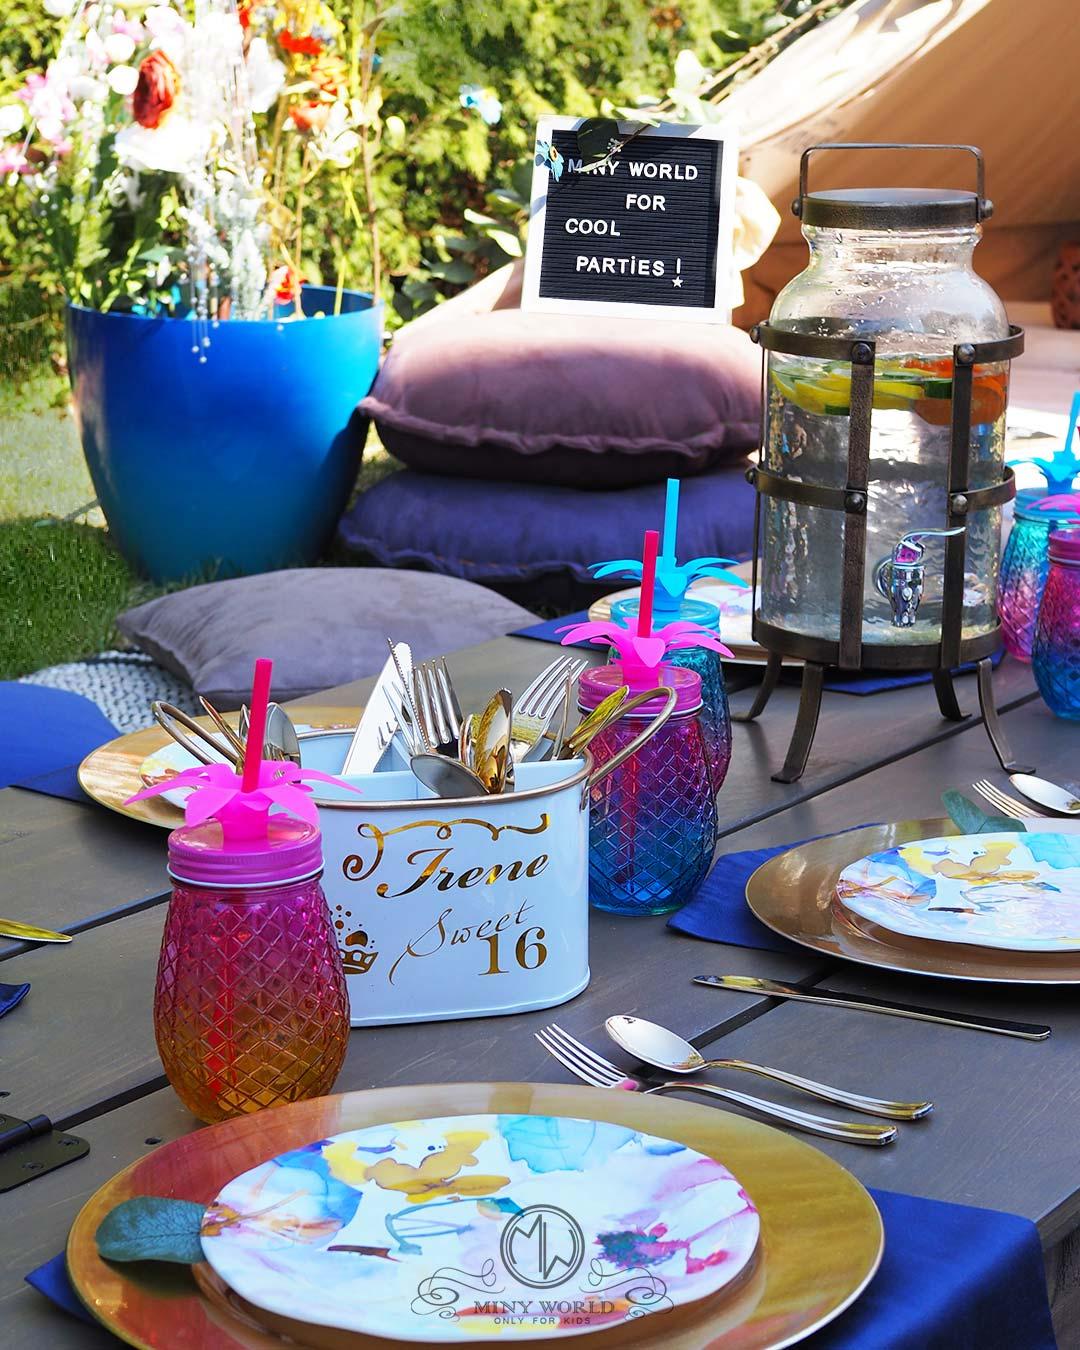 Bel-tent-party-miny-world-family-74